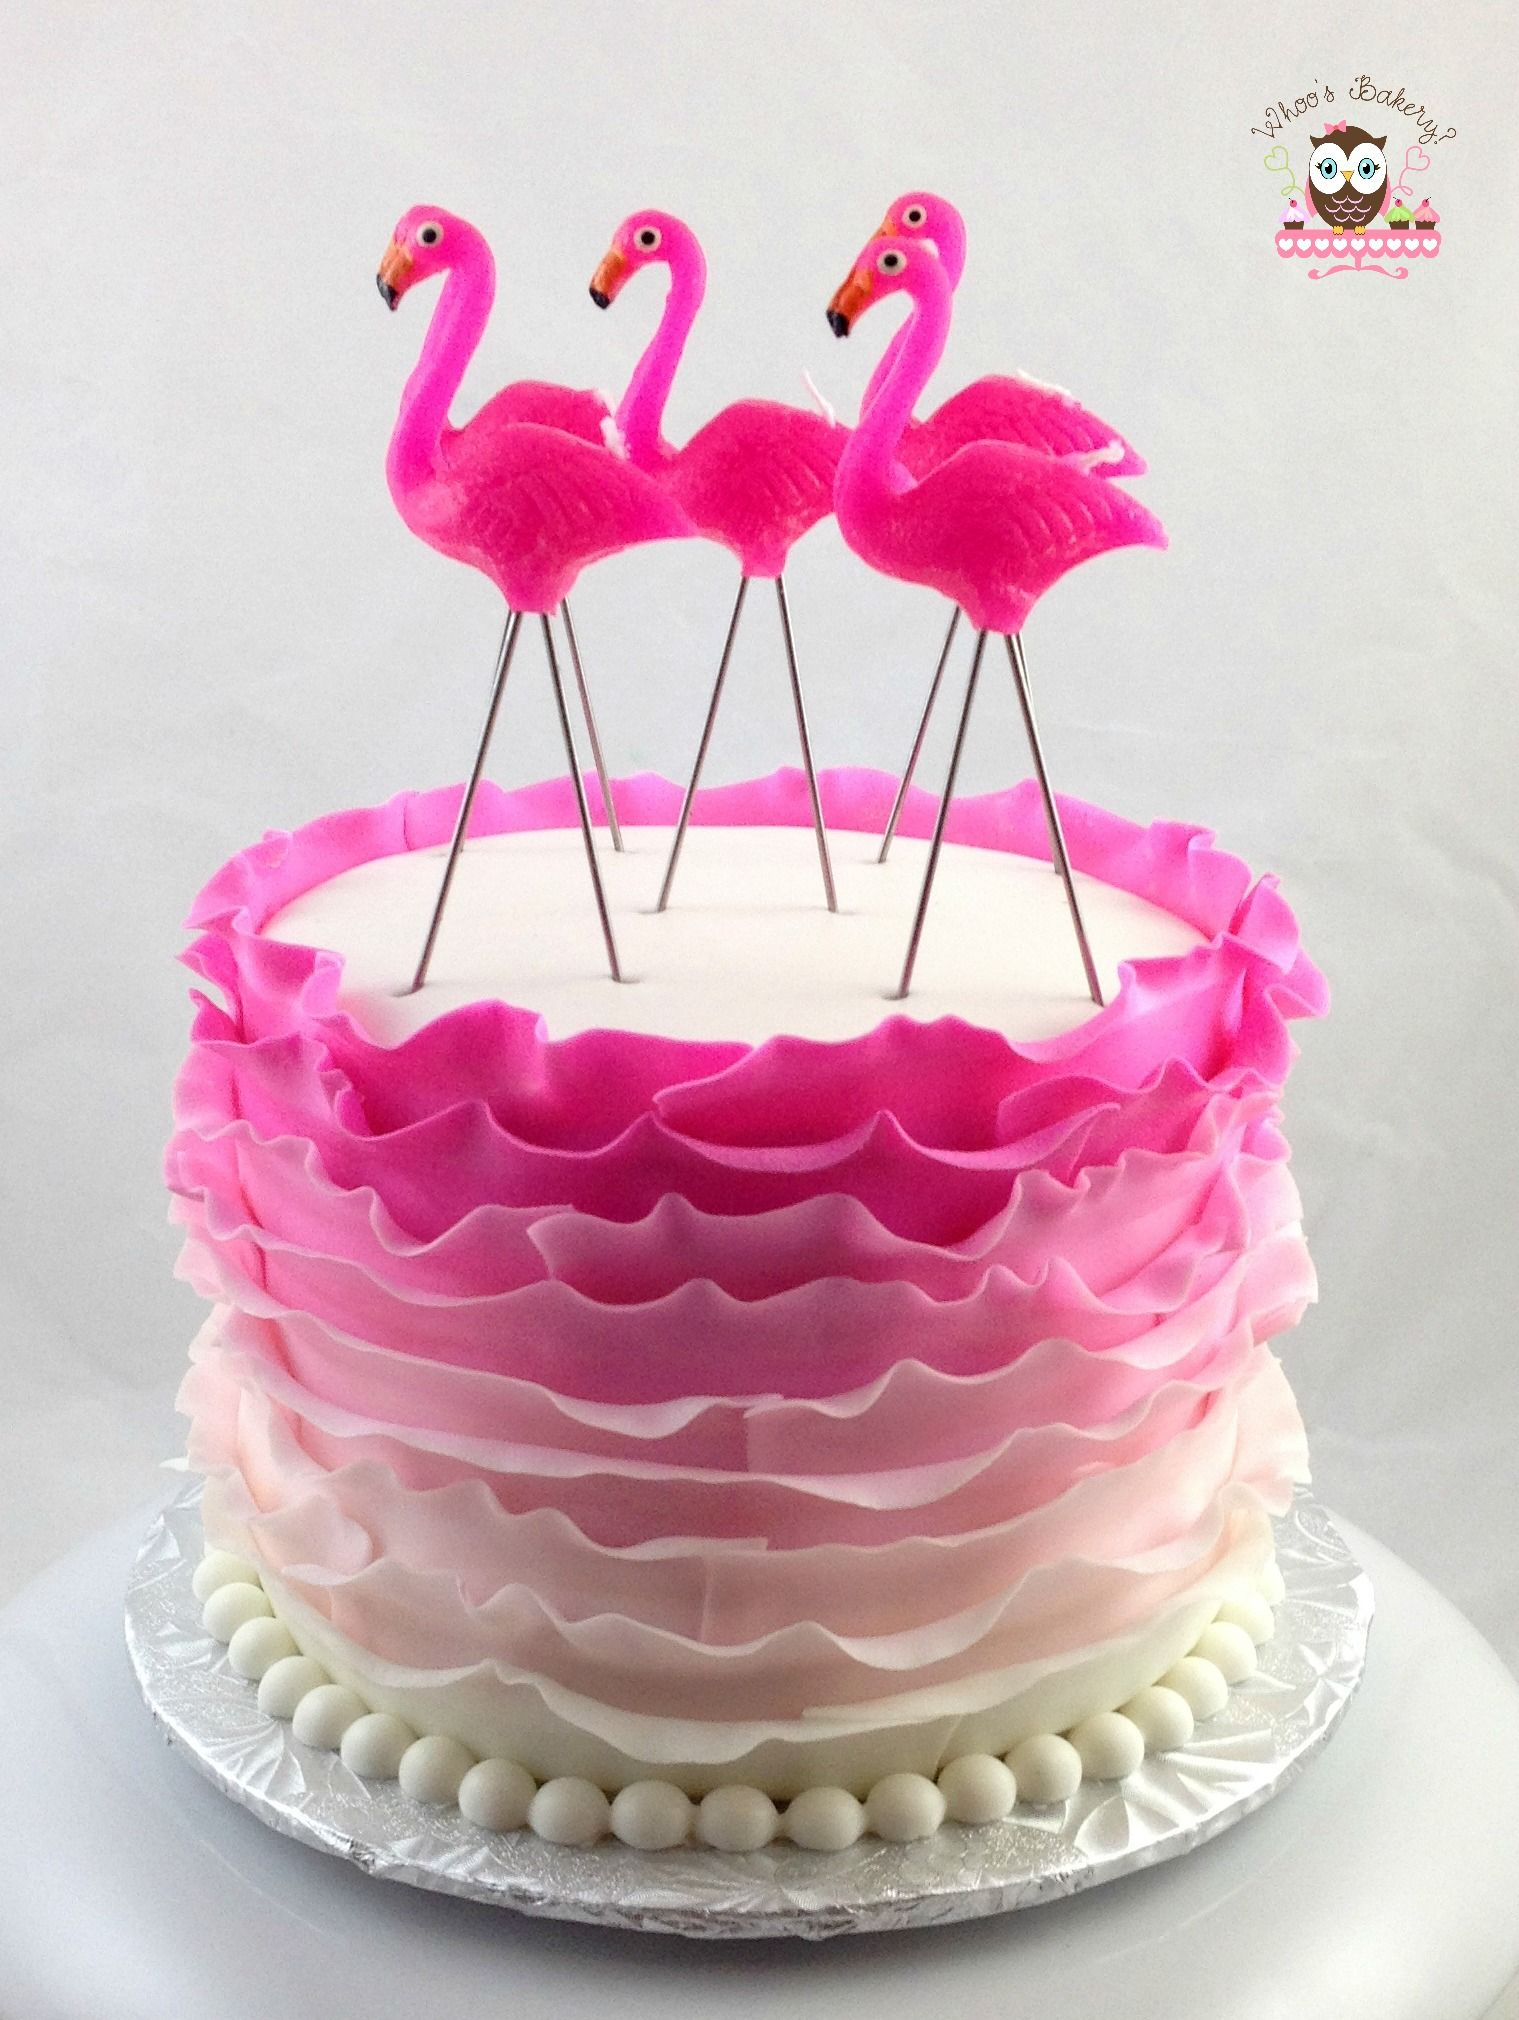 pink flamingo cake flamingo cake ruffle cake flirty cake pink cake cakes cupcakes. Black Bedroom Furniture Sets. Home Design Ideas